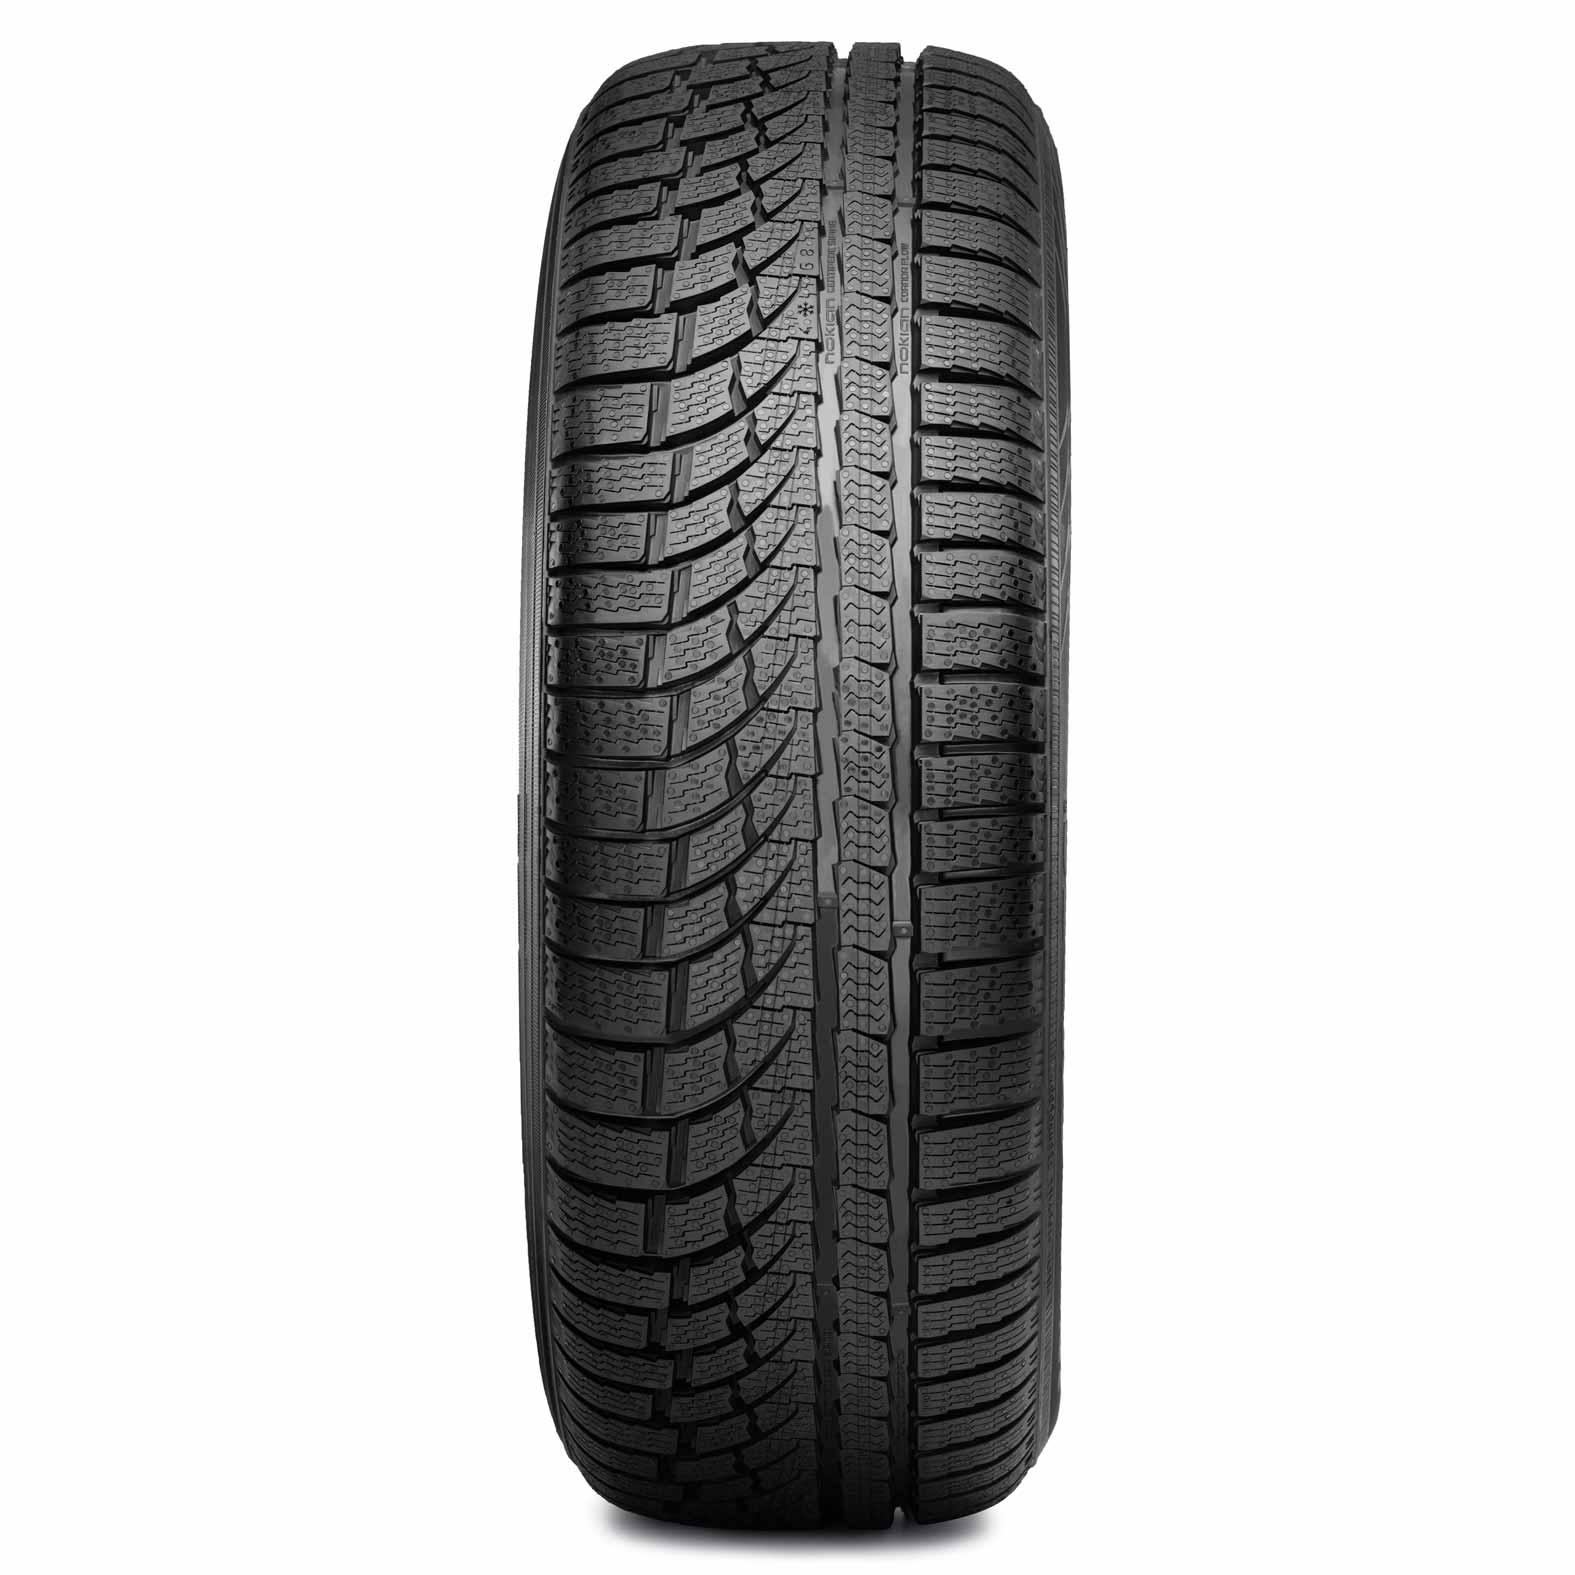 Nokian Tires Review >> Nokian Wrg4 Tires